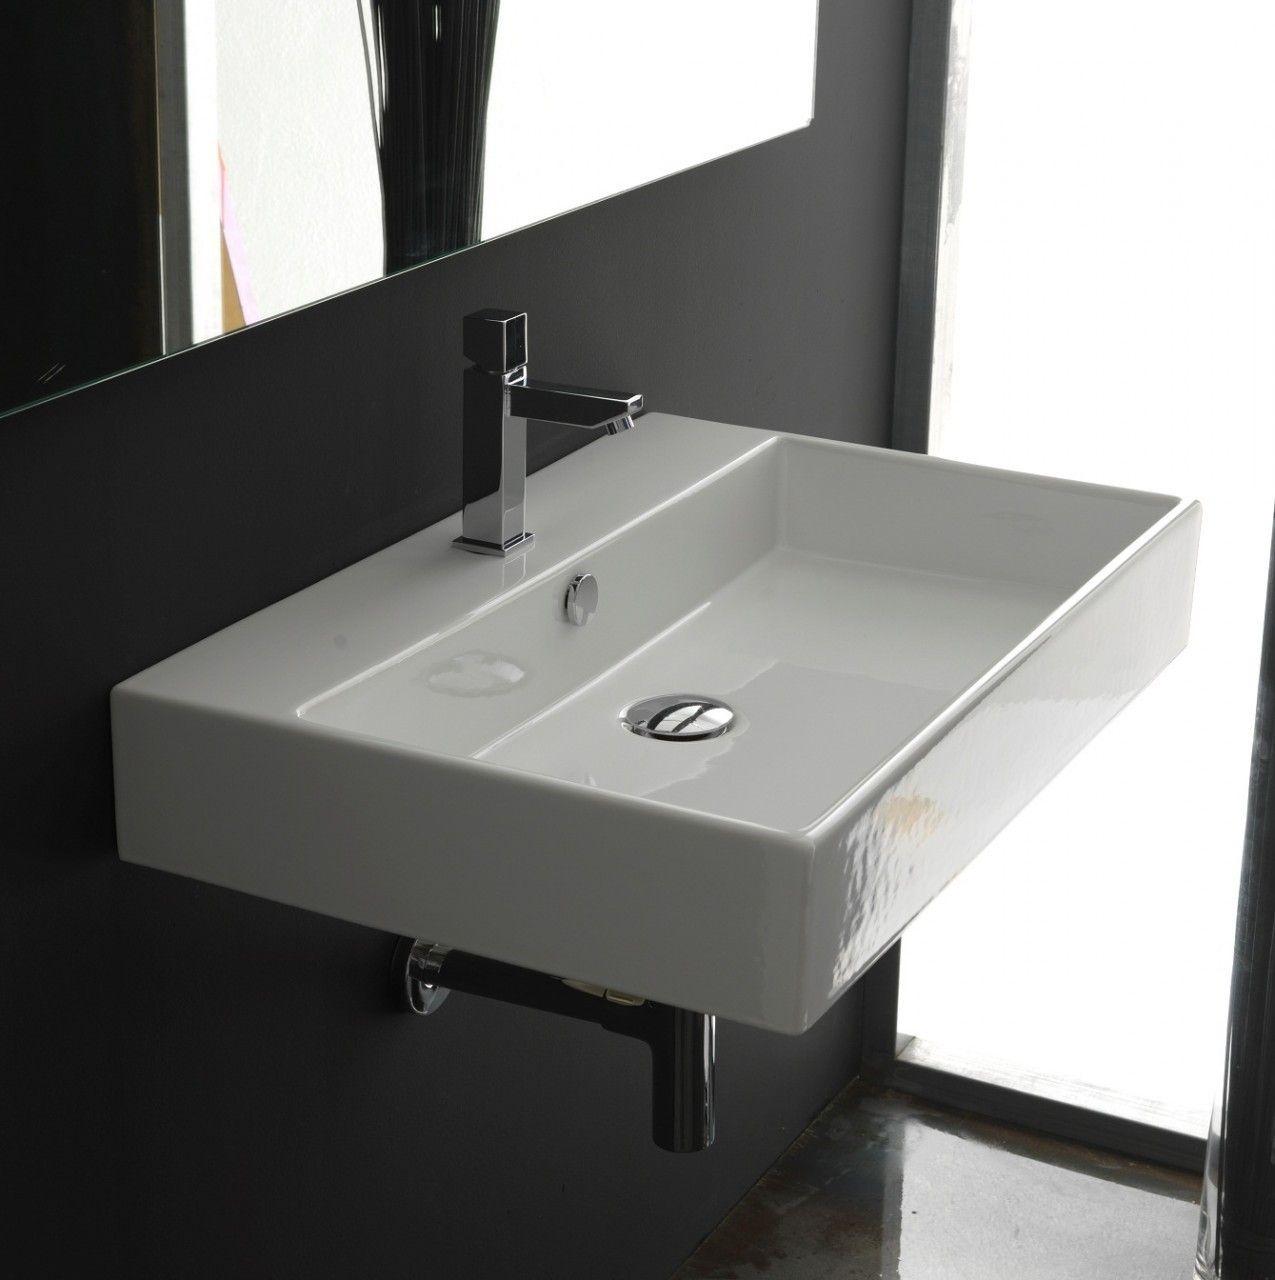 Ws Bath Collections Unlimited 60 Wall Mounted Vessel Bathroom Sink 23 6 Rectangular Sink Bathroom Wall Mounted Bathroom Sinks Ceramic Bathroom Sink